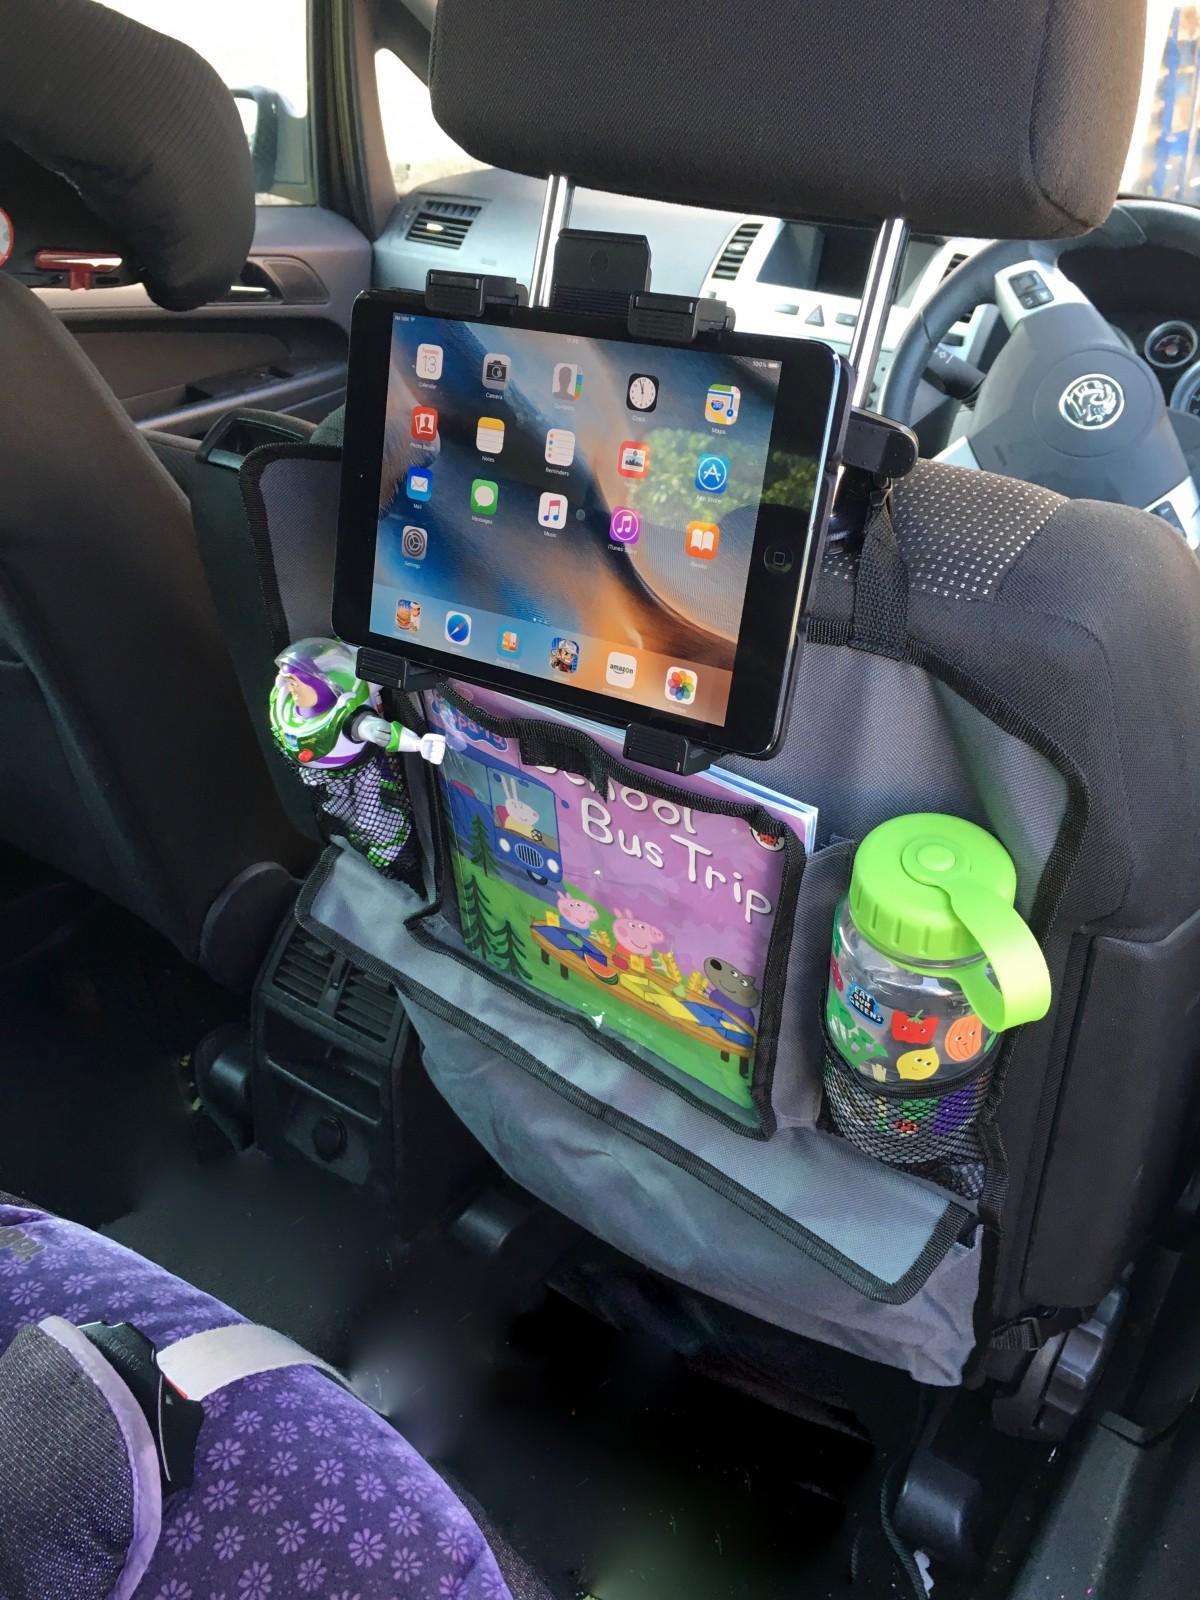 Harrogate Mama, Harrogate Mama Blog, Hackonsted, Car Seat Protectors, Kick Mats, Yorkshire, Blogger, Harrogate, Mama, Blog,IMG_2276.jpg